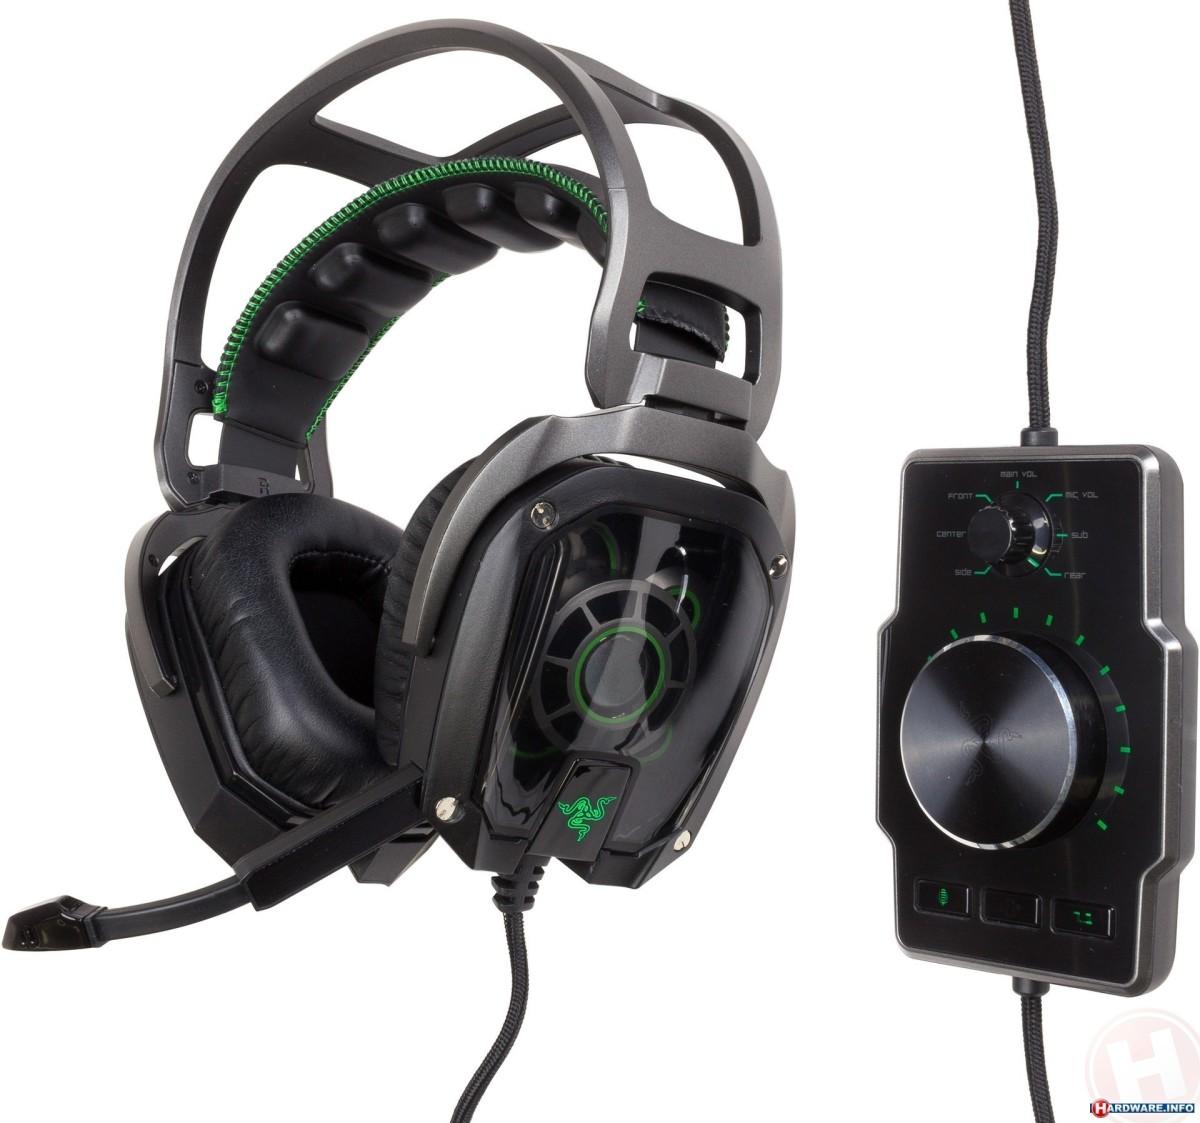 The Razer Tiamat 7.1 Gaming Headset